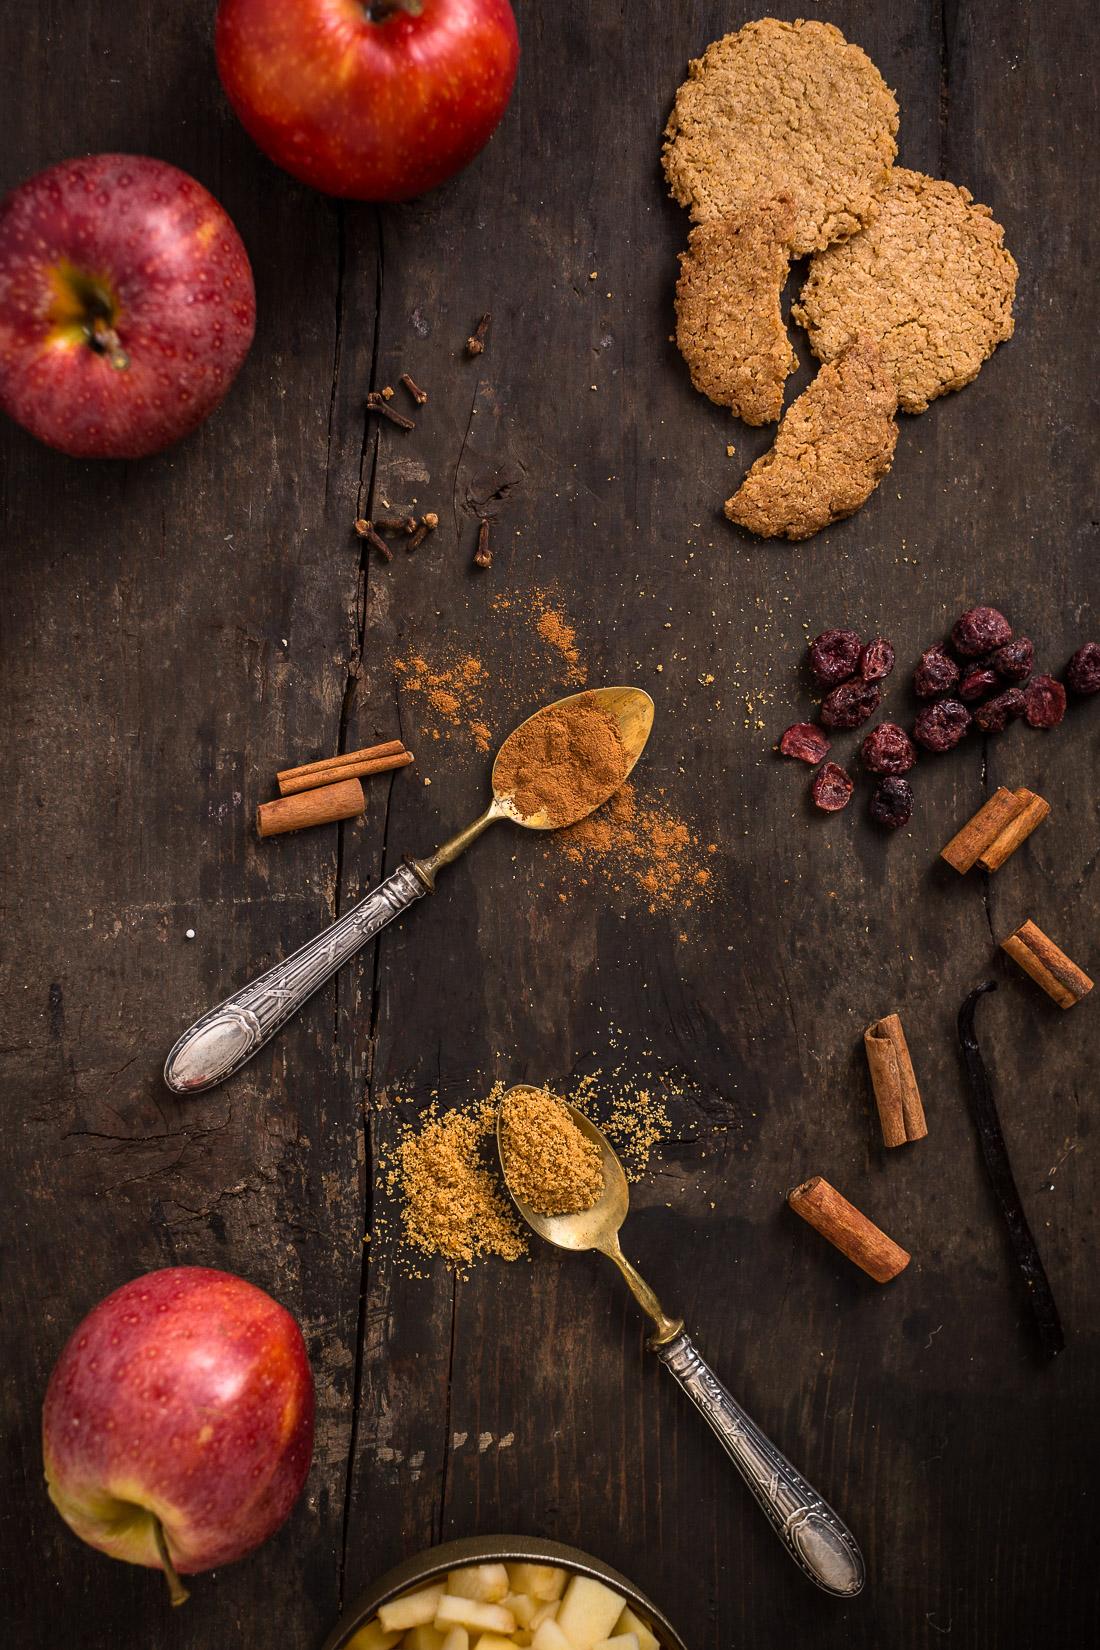 Vegan apple strudel recipe Ricetta Strudel di mele vegan senza uova senza burro ingredienti